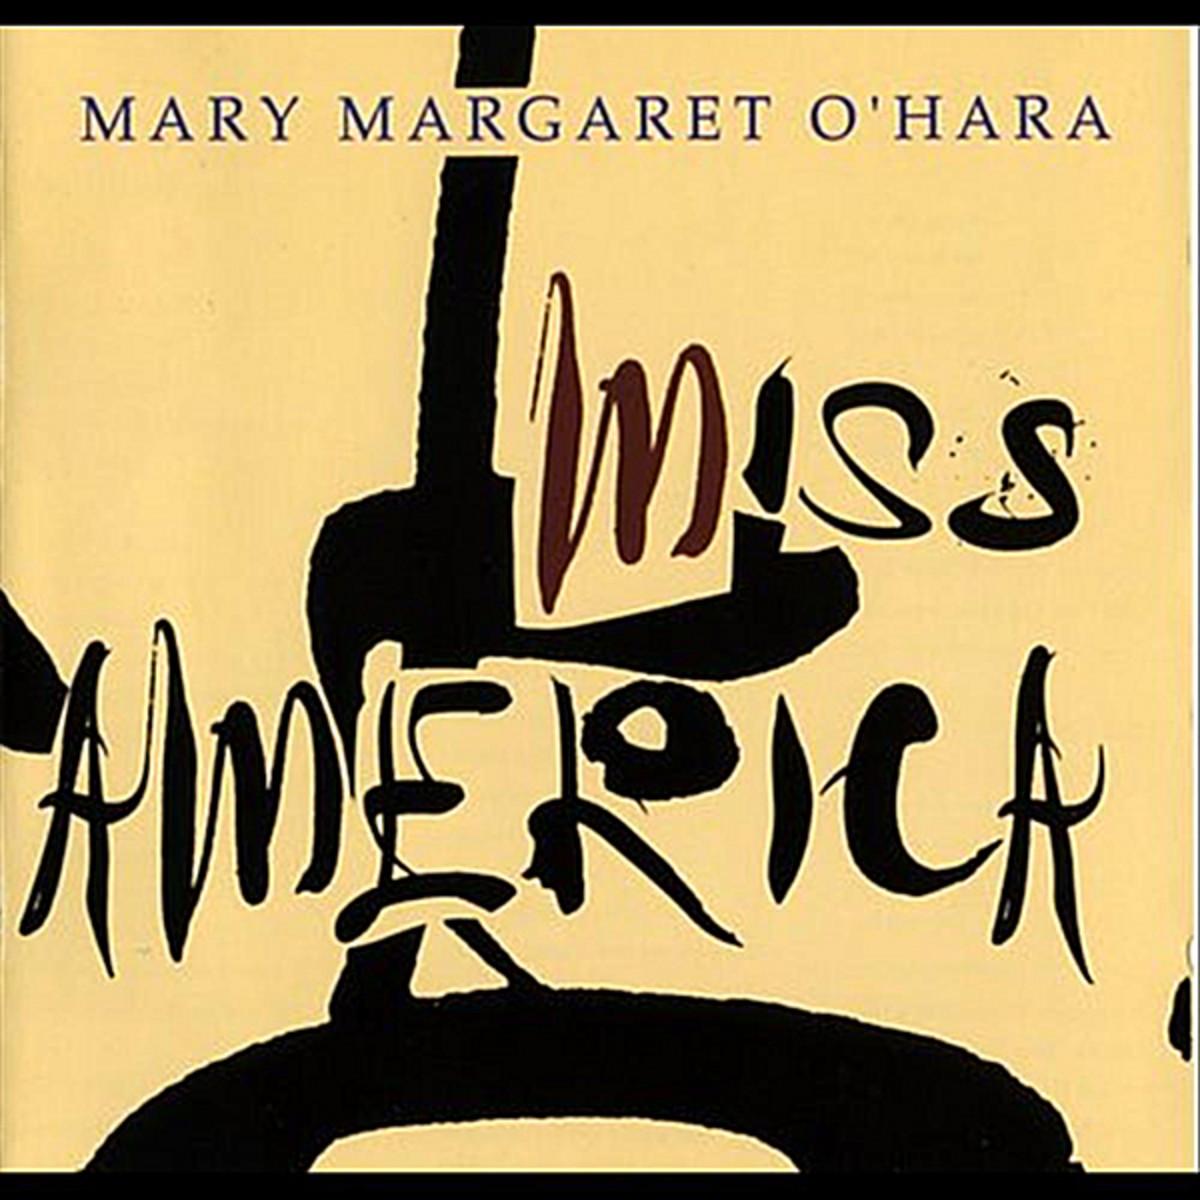 Miss America, Mary Margaret O'Hara